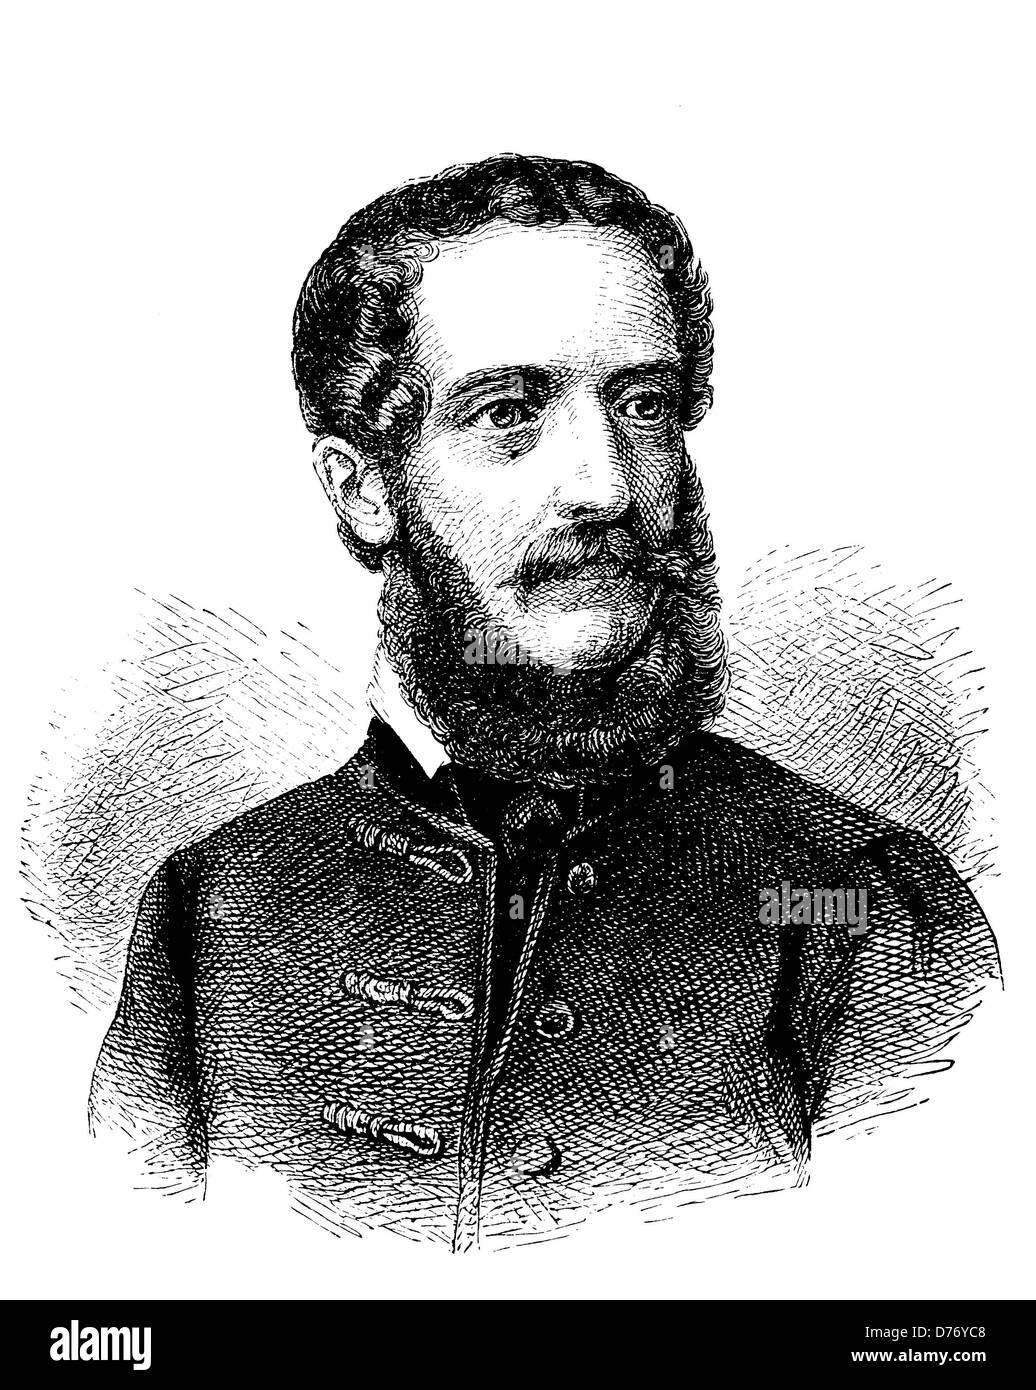 Louis Kossuth, 1802 - 1894, Hungarian national hero, historical woodcut, circa 1880 Stock Photo